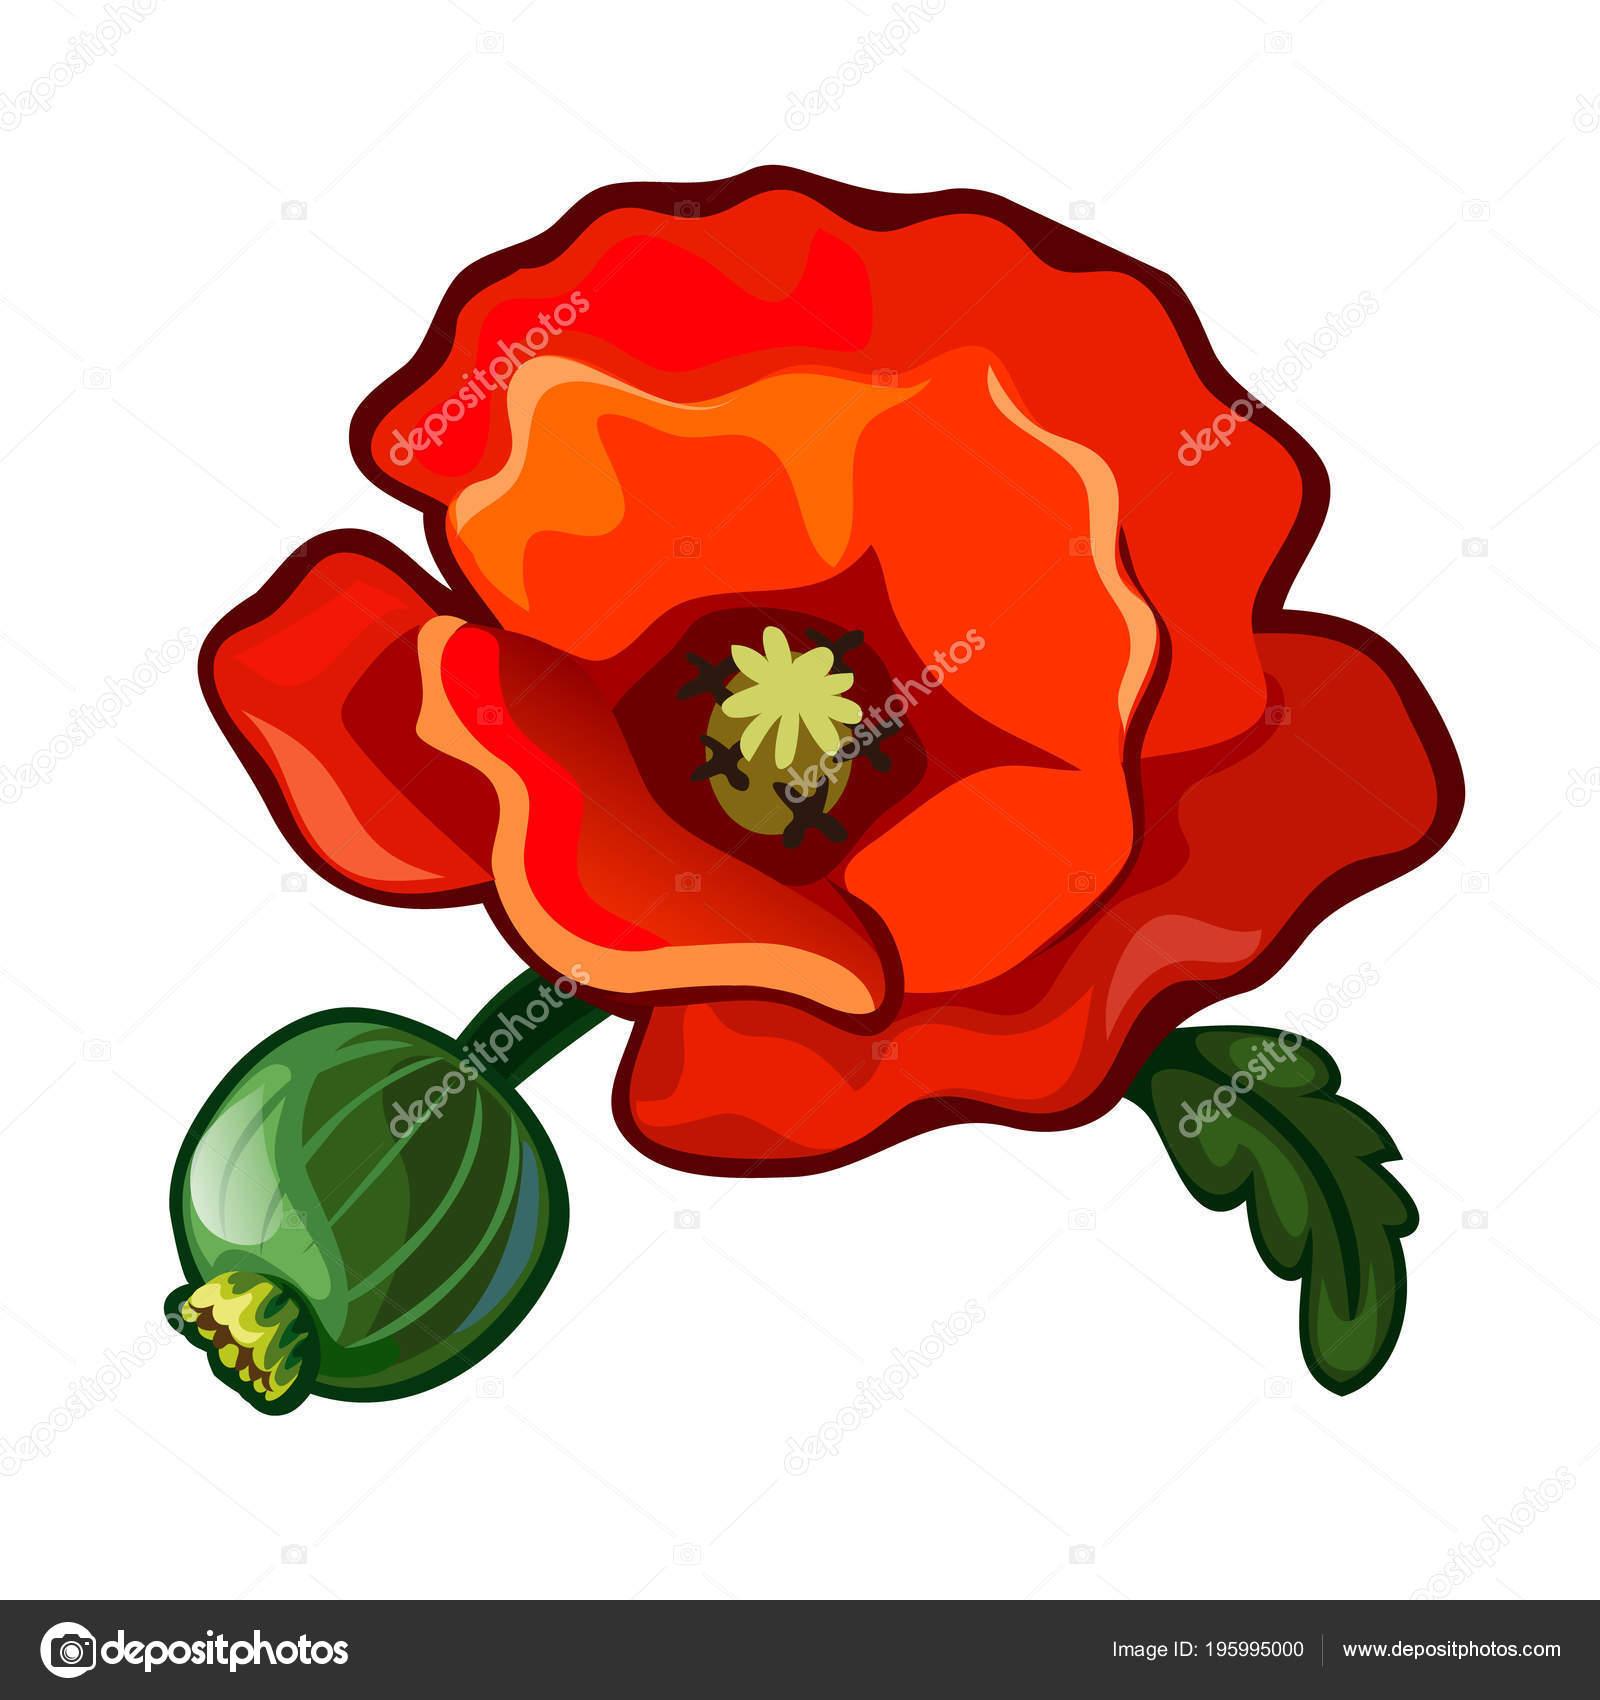 Poppy Flower Beautiful Red Plant Grass Wildlife Image In Cartoon